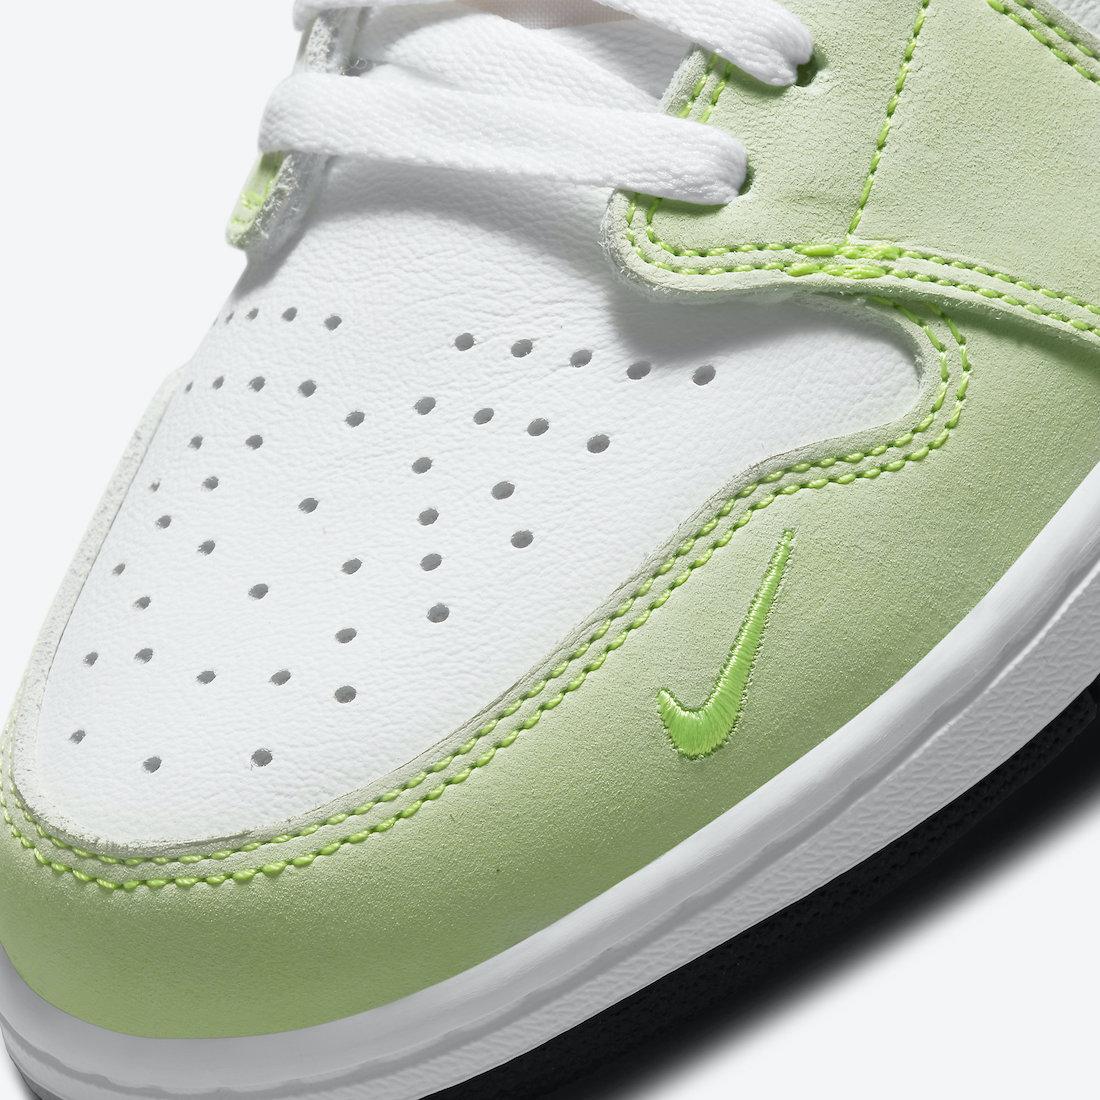 Air-Jordan-1-Low-OG-Ghost-Green-CZ0790-103-Release-Date-6